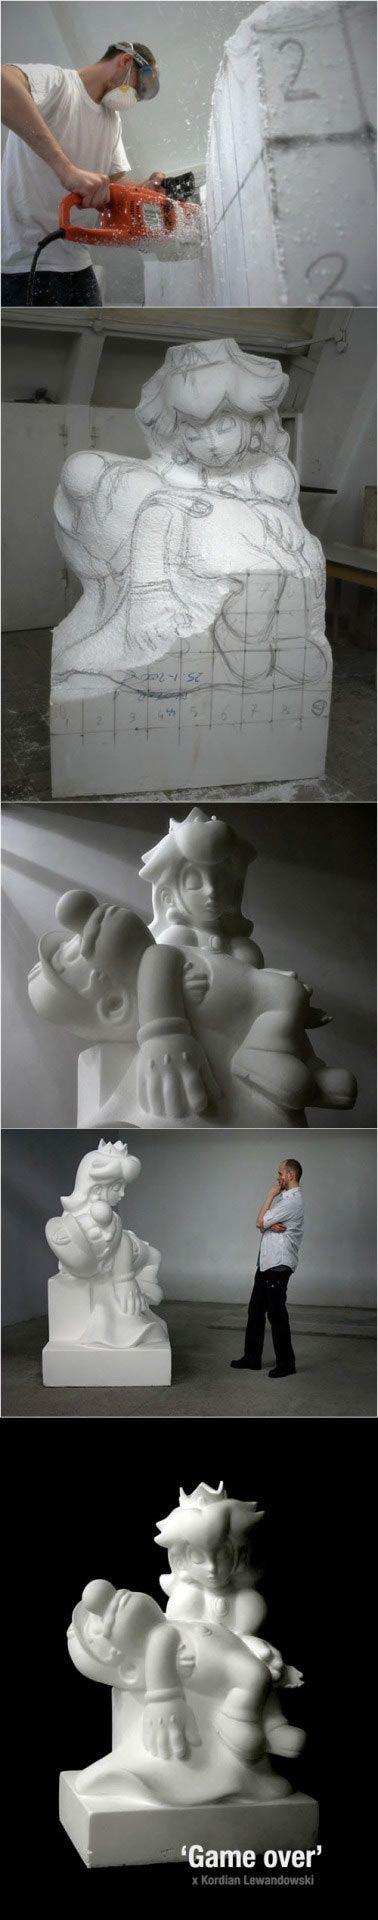 Bilderparade CDII – Neea Devil